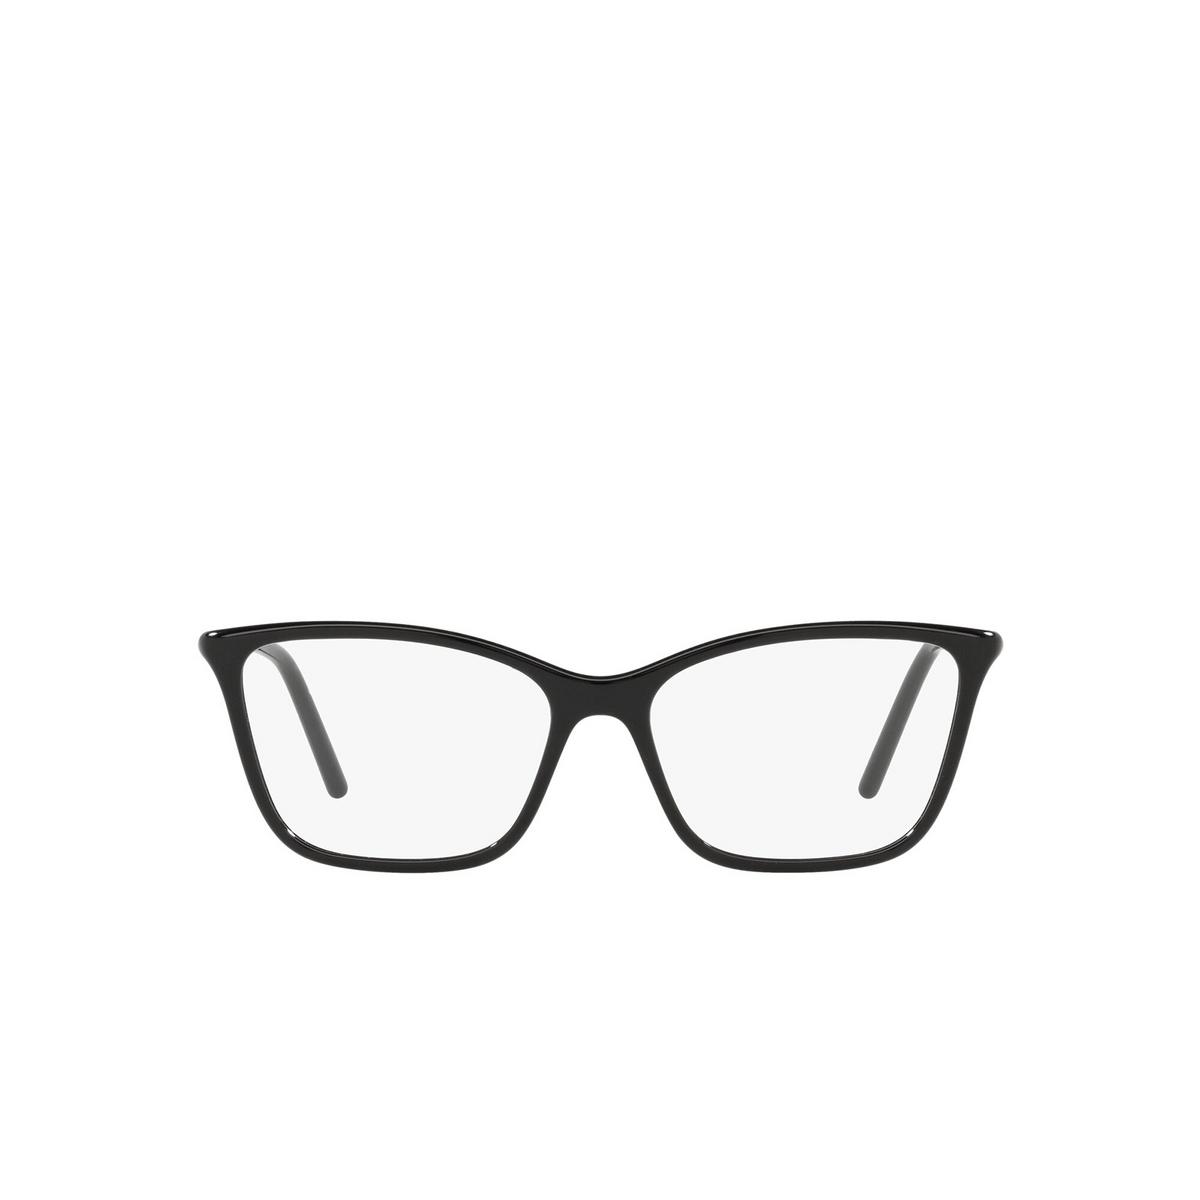 Prada® Cat-eye Eyeglasses: PR 08WV color Black 1AB1O1 - front view.